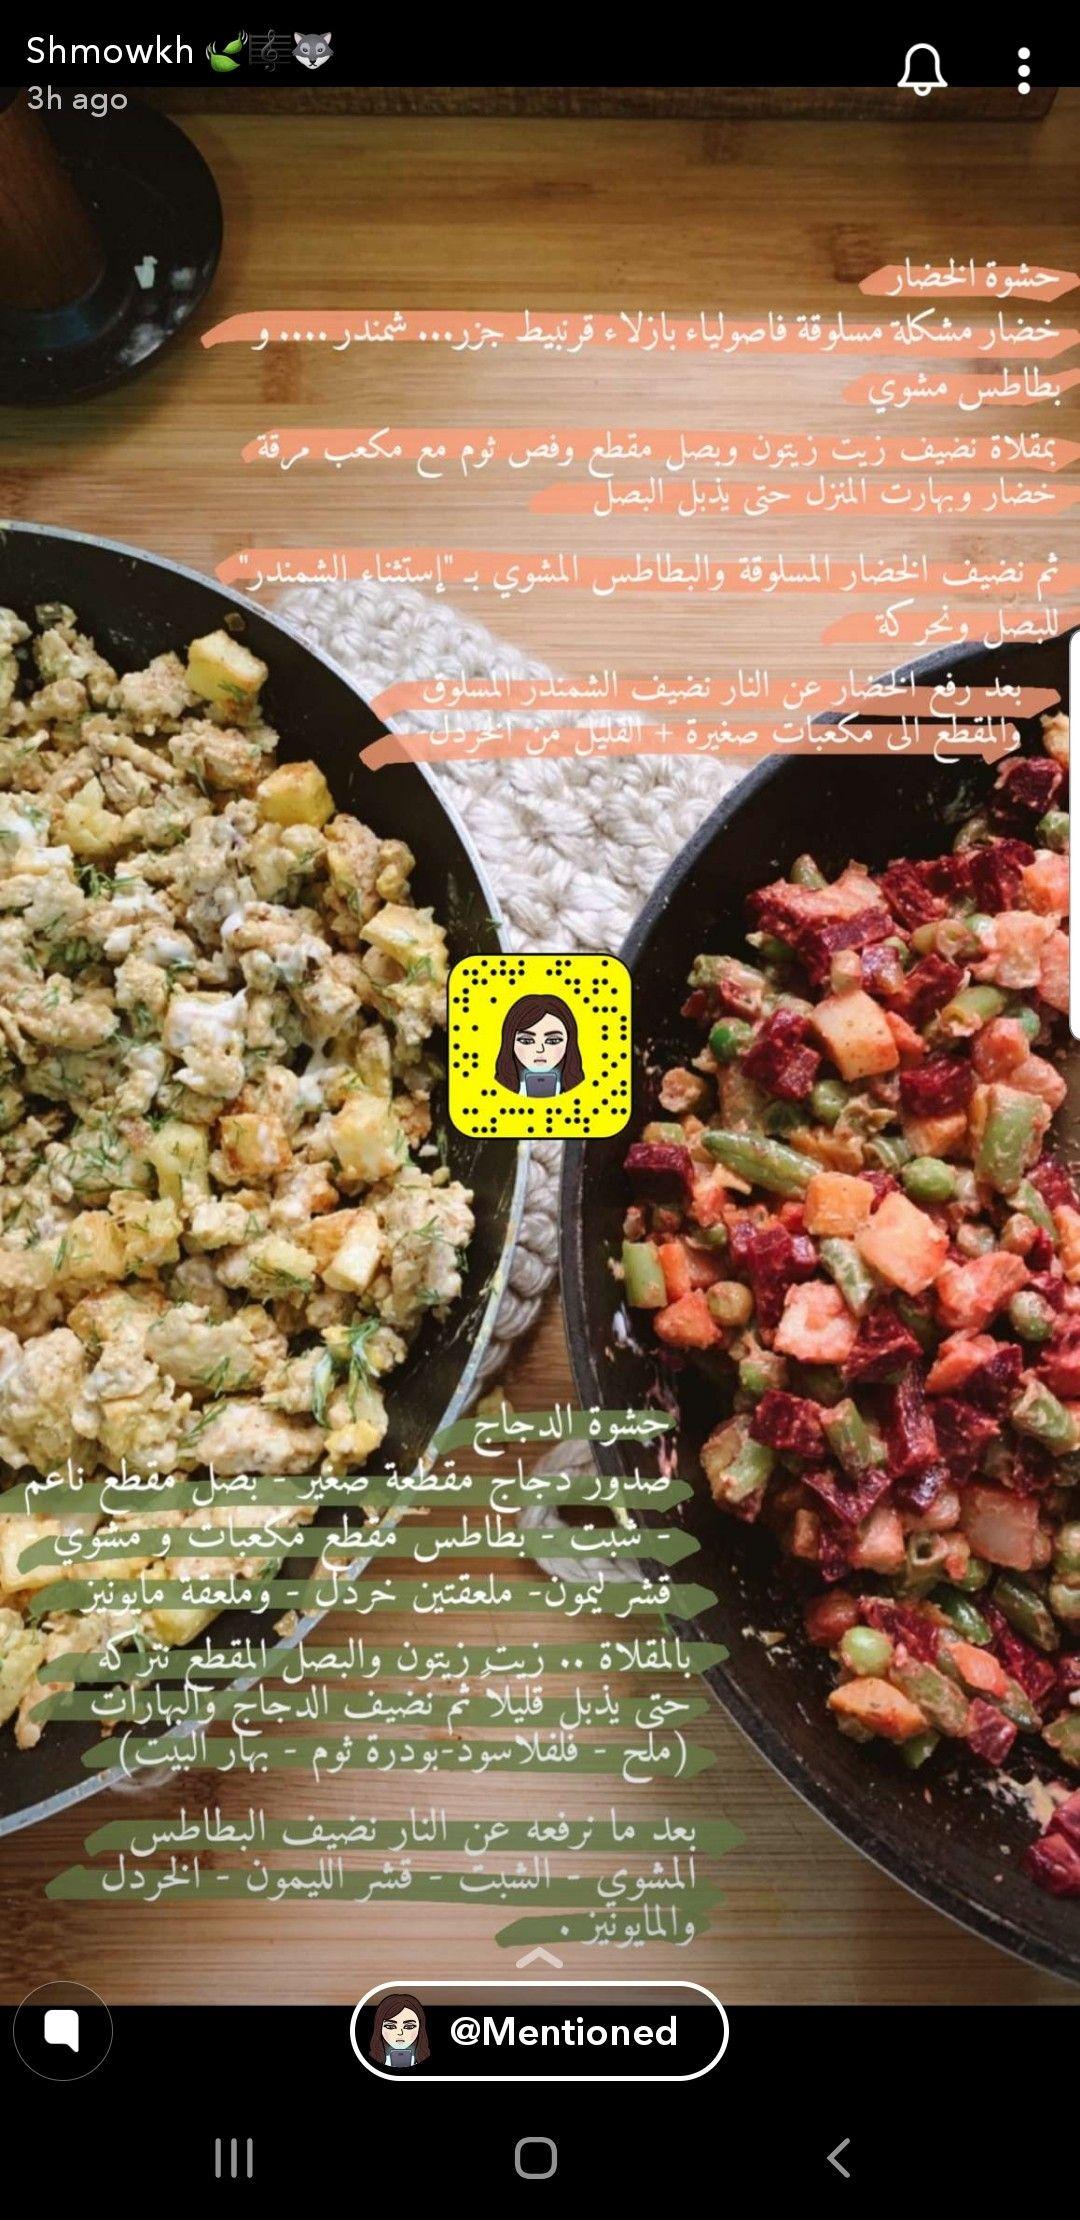 حشوة الجبن للسمبوسة Cookout Food Food Receipes Fun Baking Recipes